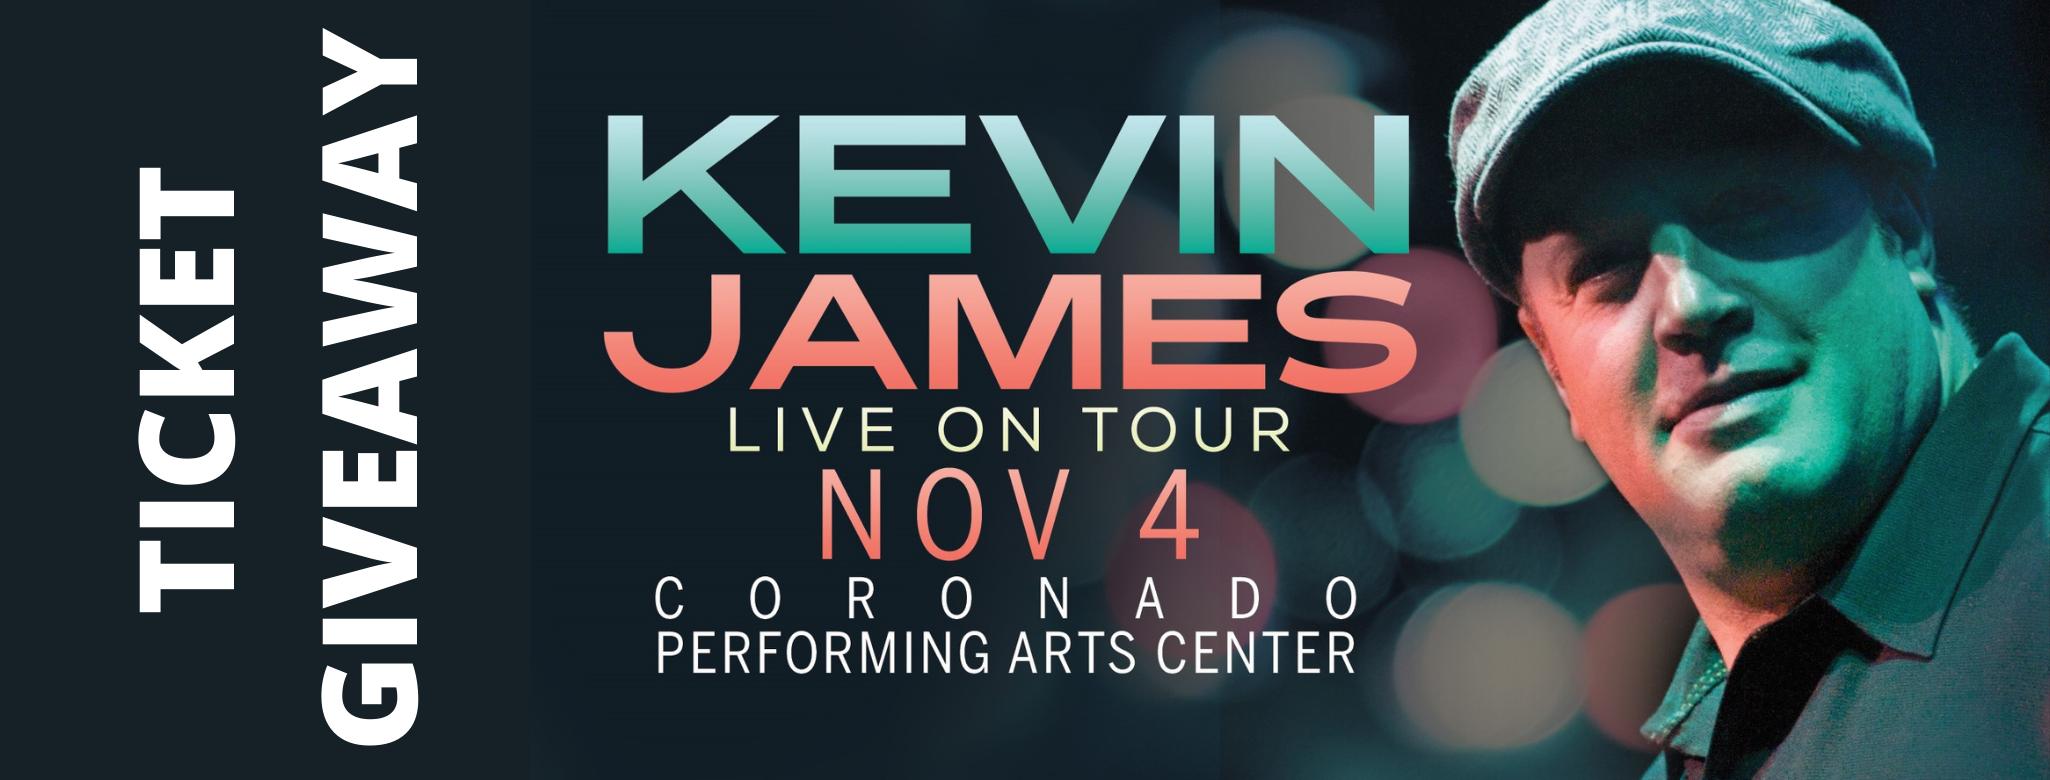 Kevin James Ticket Giveaway